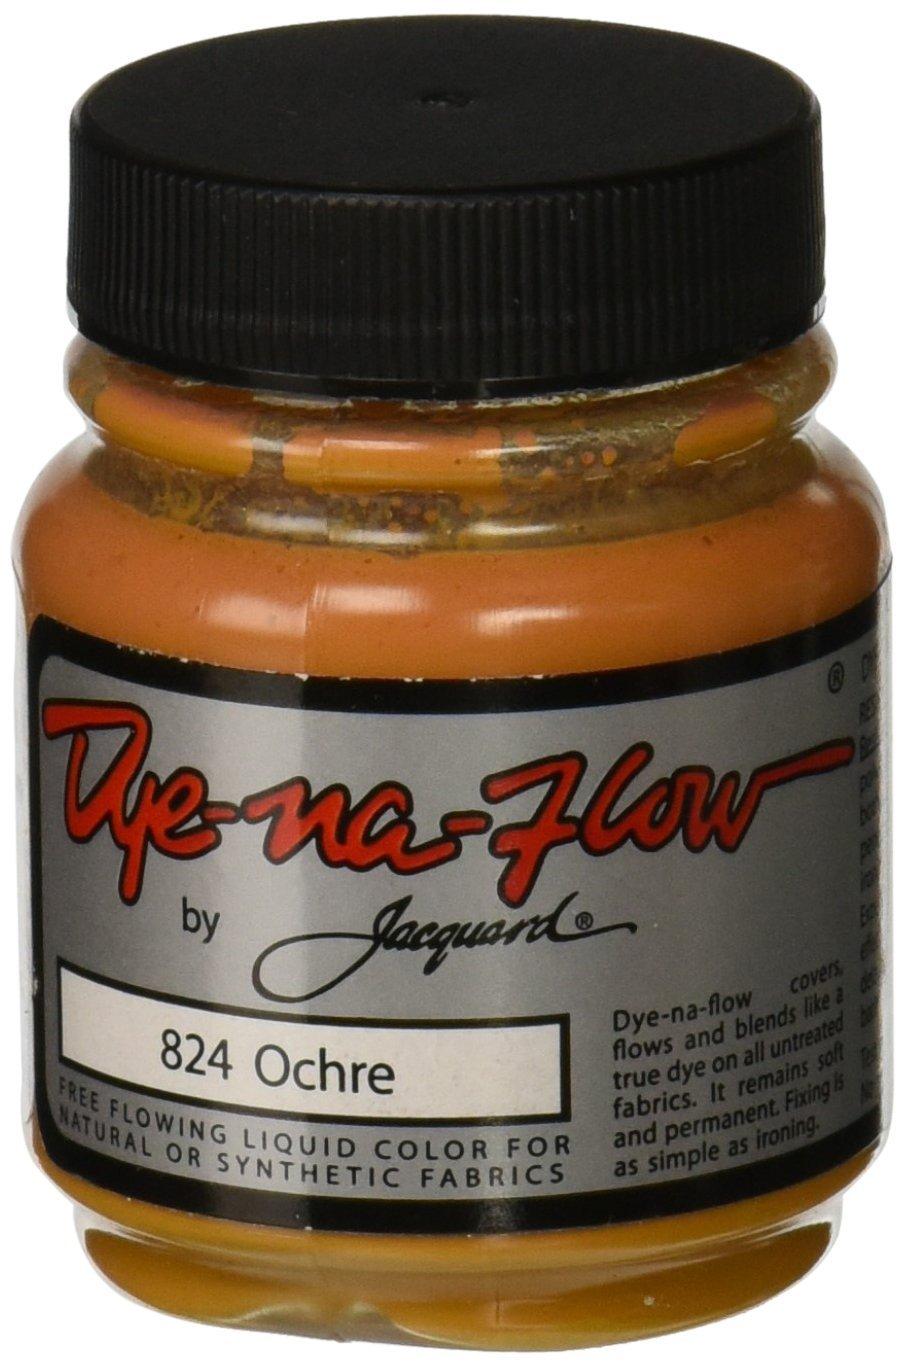 Jacquard Products JAC1-829 Sewing Dye-Na-Flow Liquid Color 2-1/4 Ounces-Black 102913